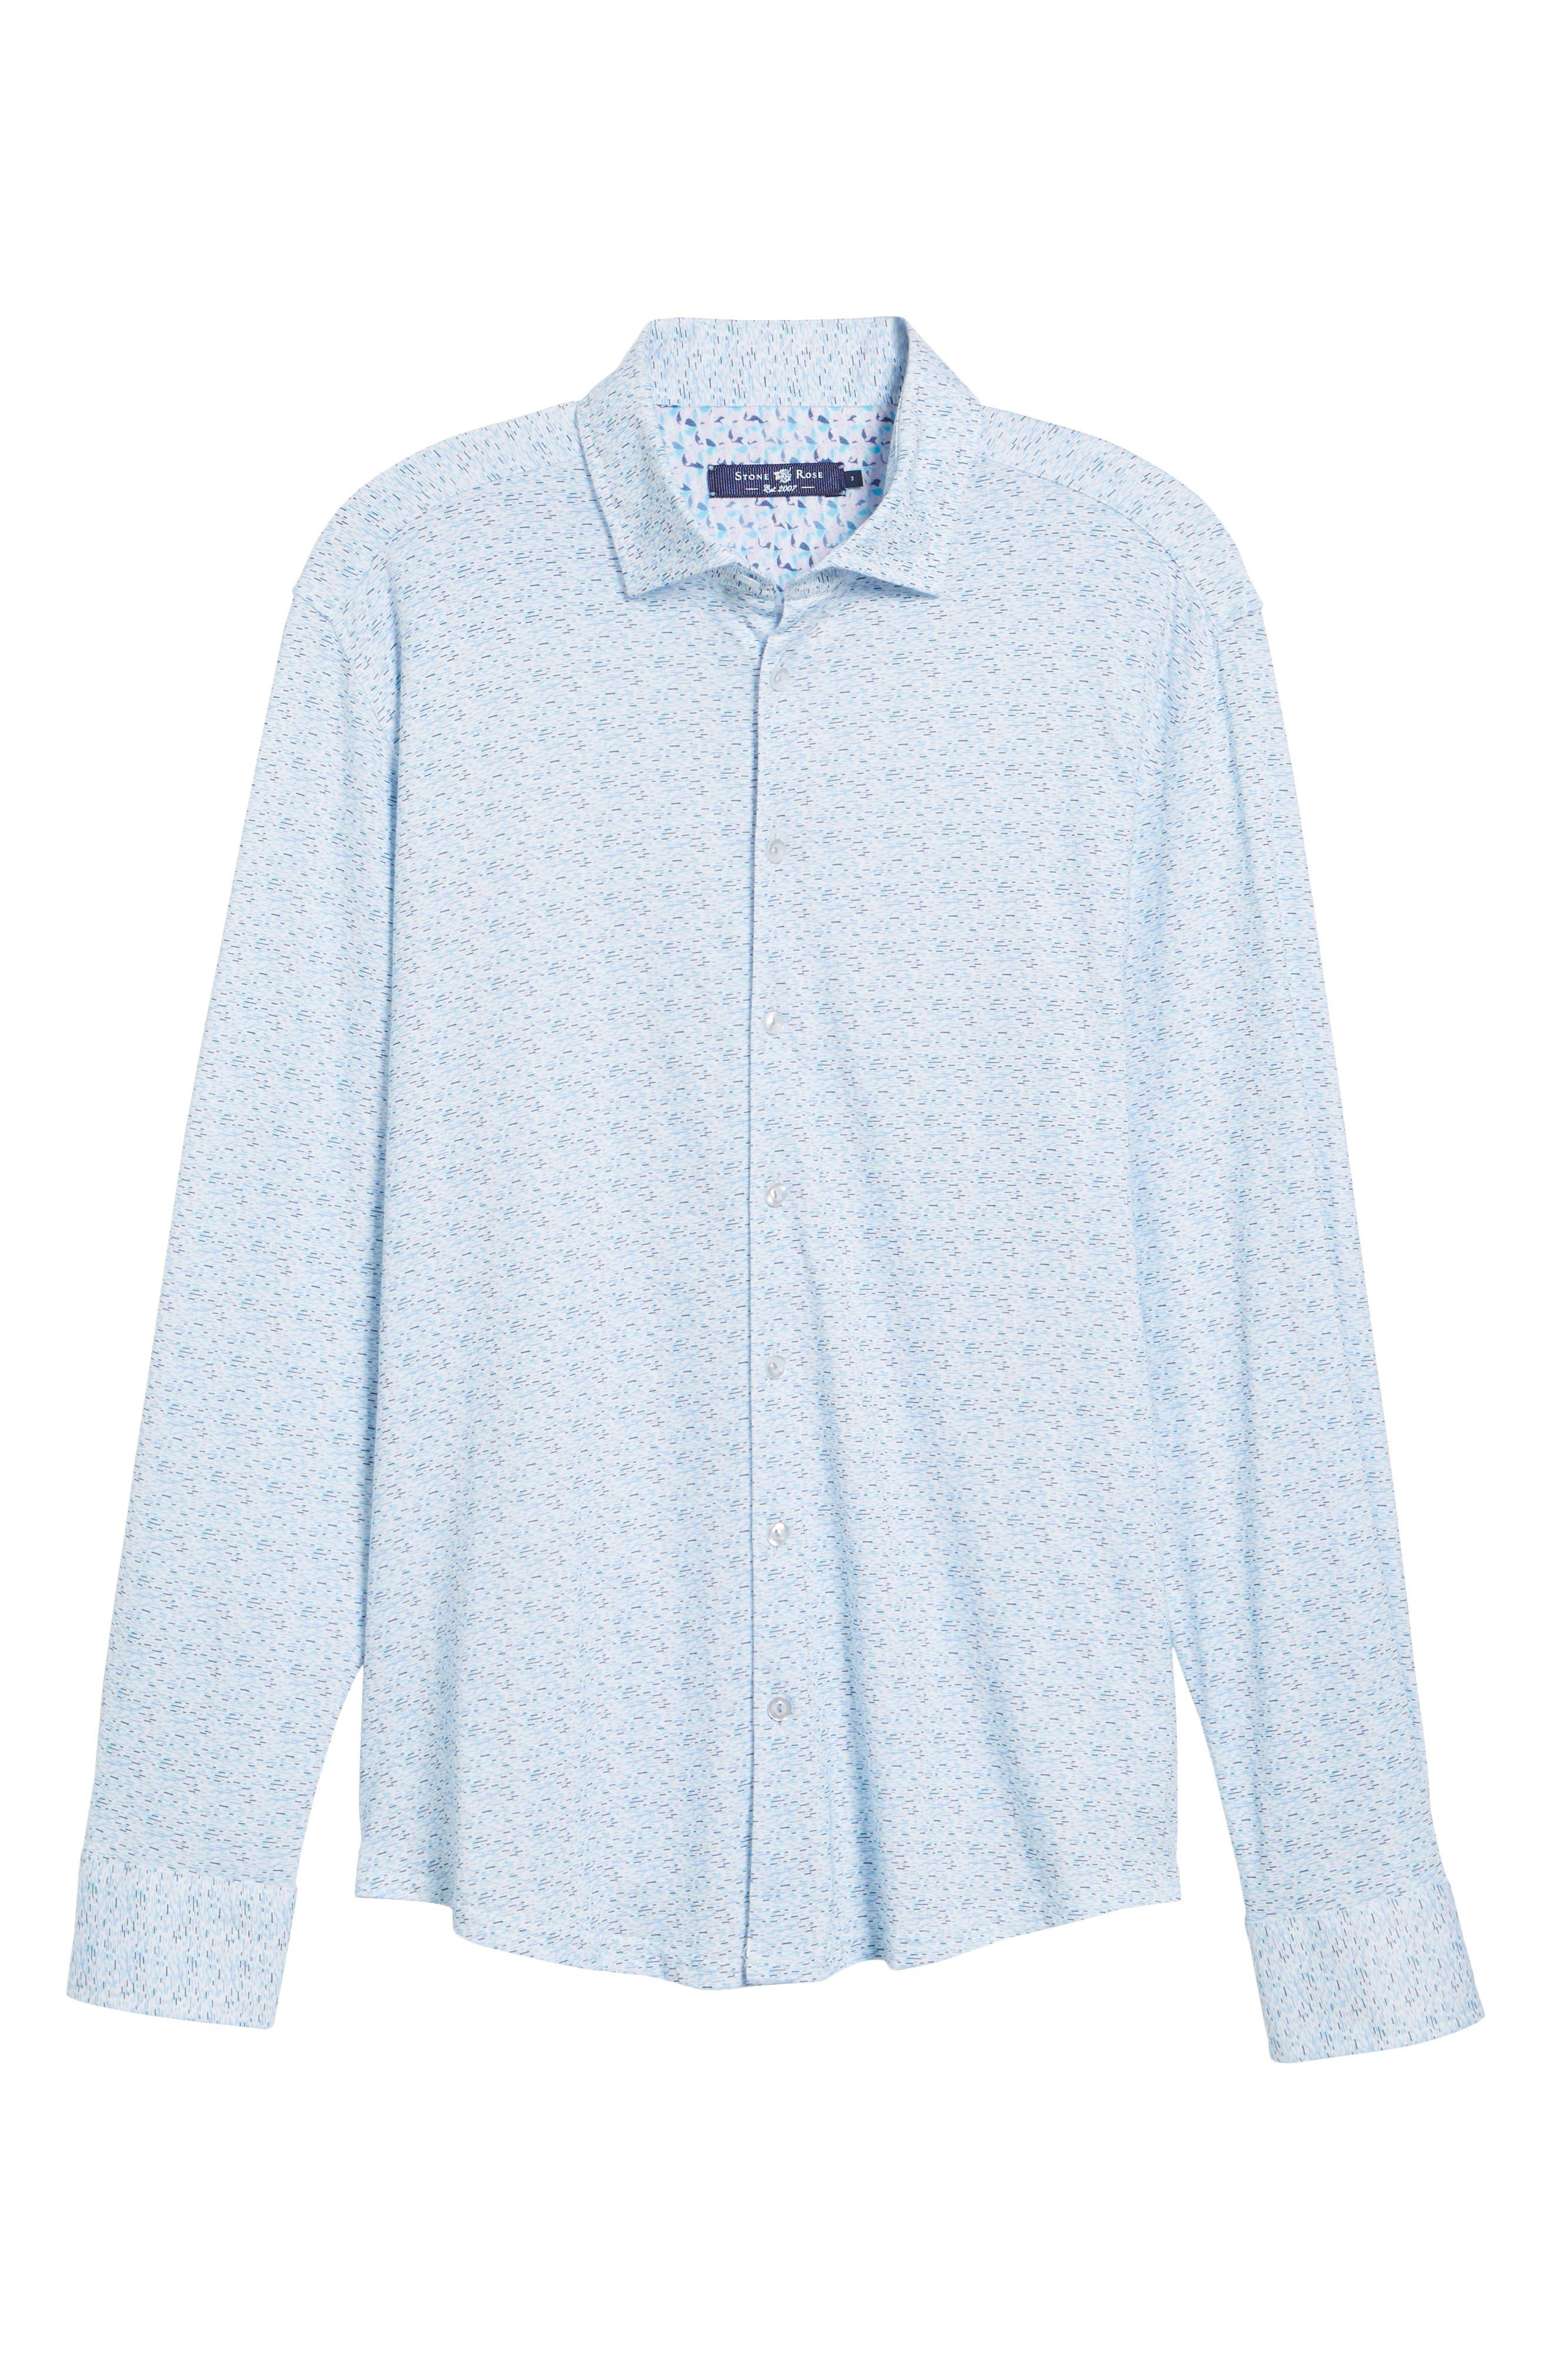 STONE ROSE,                             Contemporary Fit Print Sport Shirt,                             Alternate thumbnail 6, color,                             400